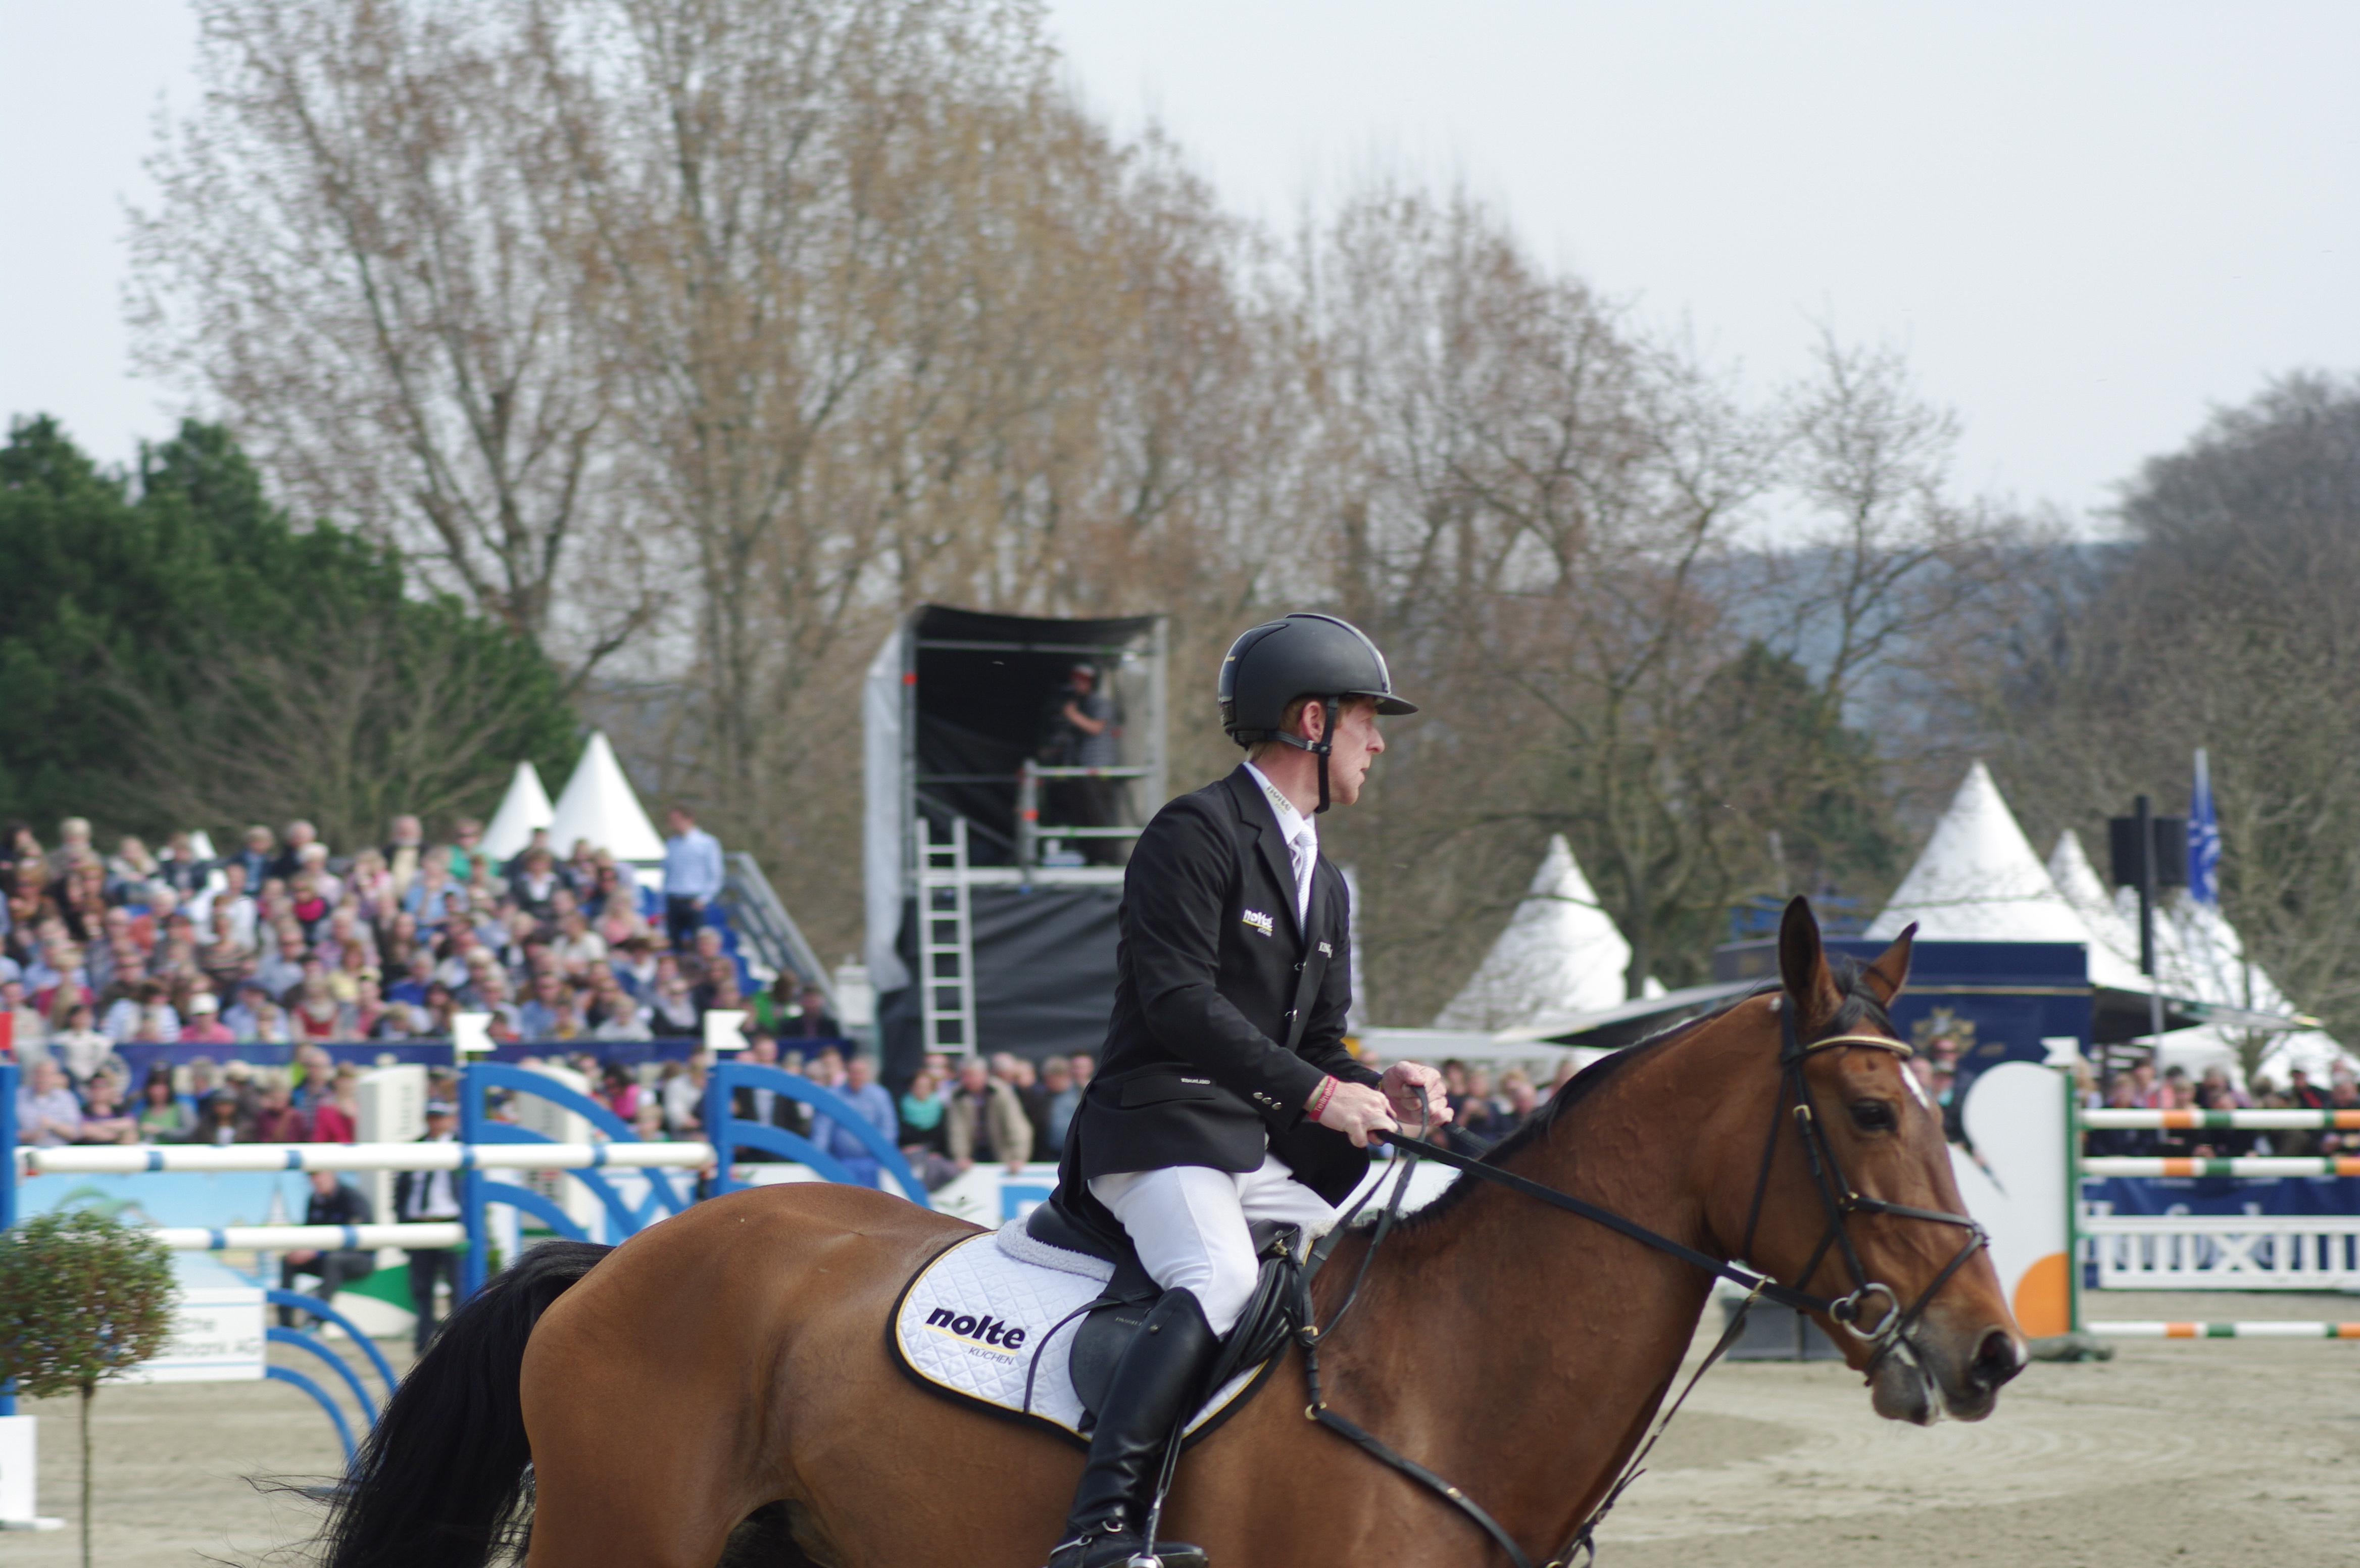 Küchengirl Marcus Ehning ~ file 13 04 21 horses and dreams marcus ehning (2 von 11